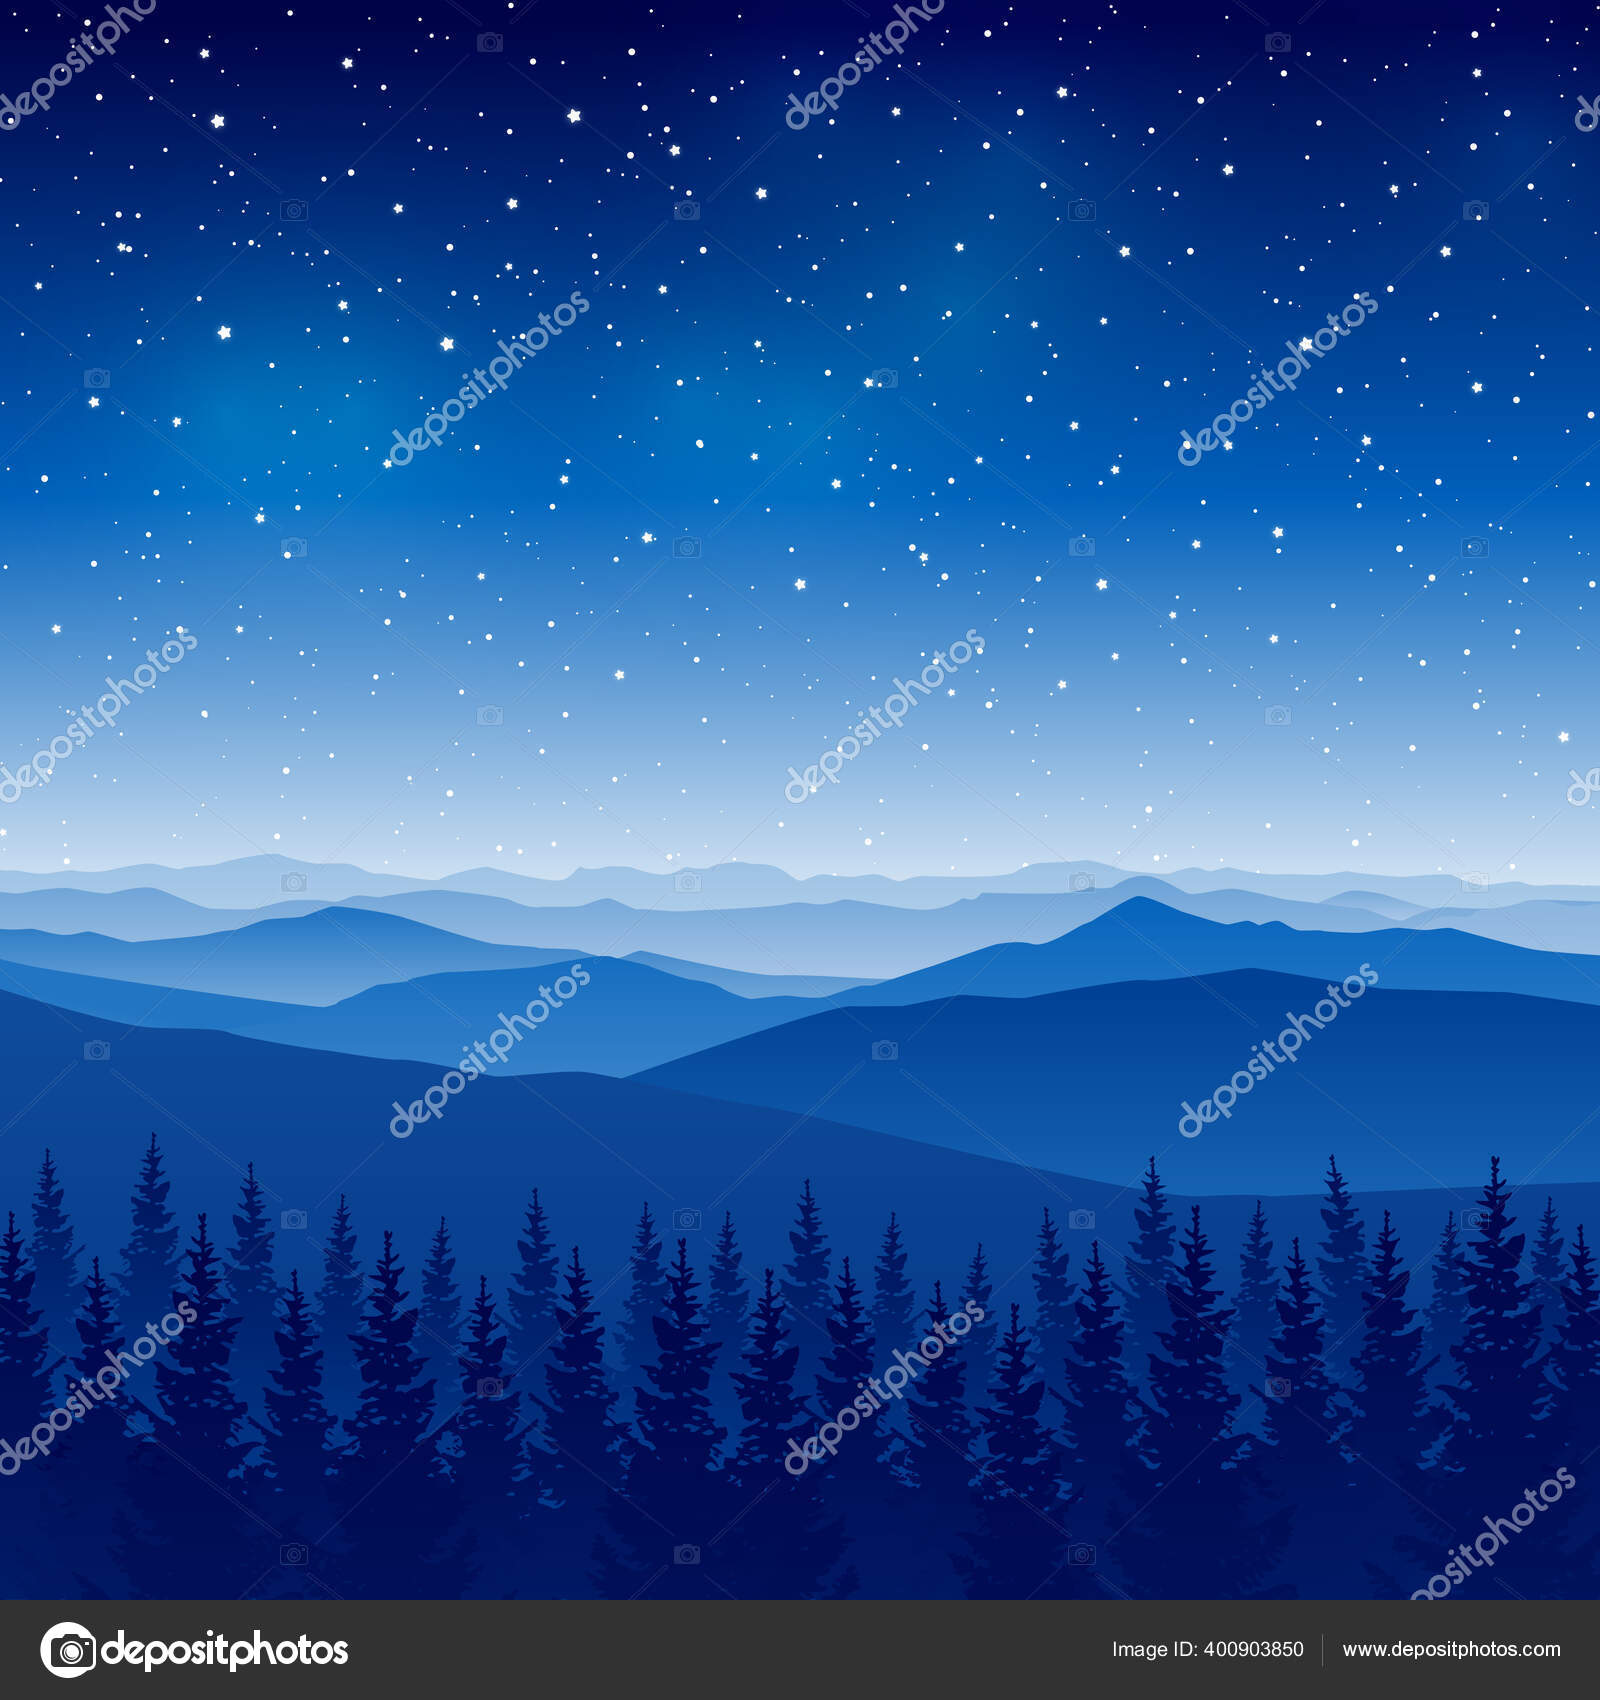 https fr depositphotos com 400903850 stock illustration mountain scene coniferous forest starry html